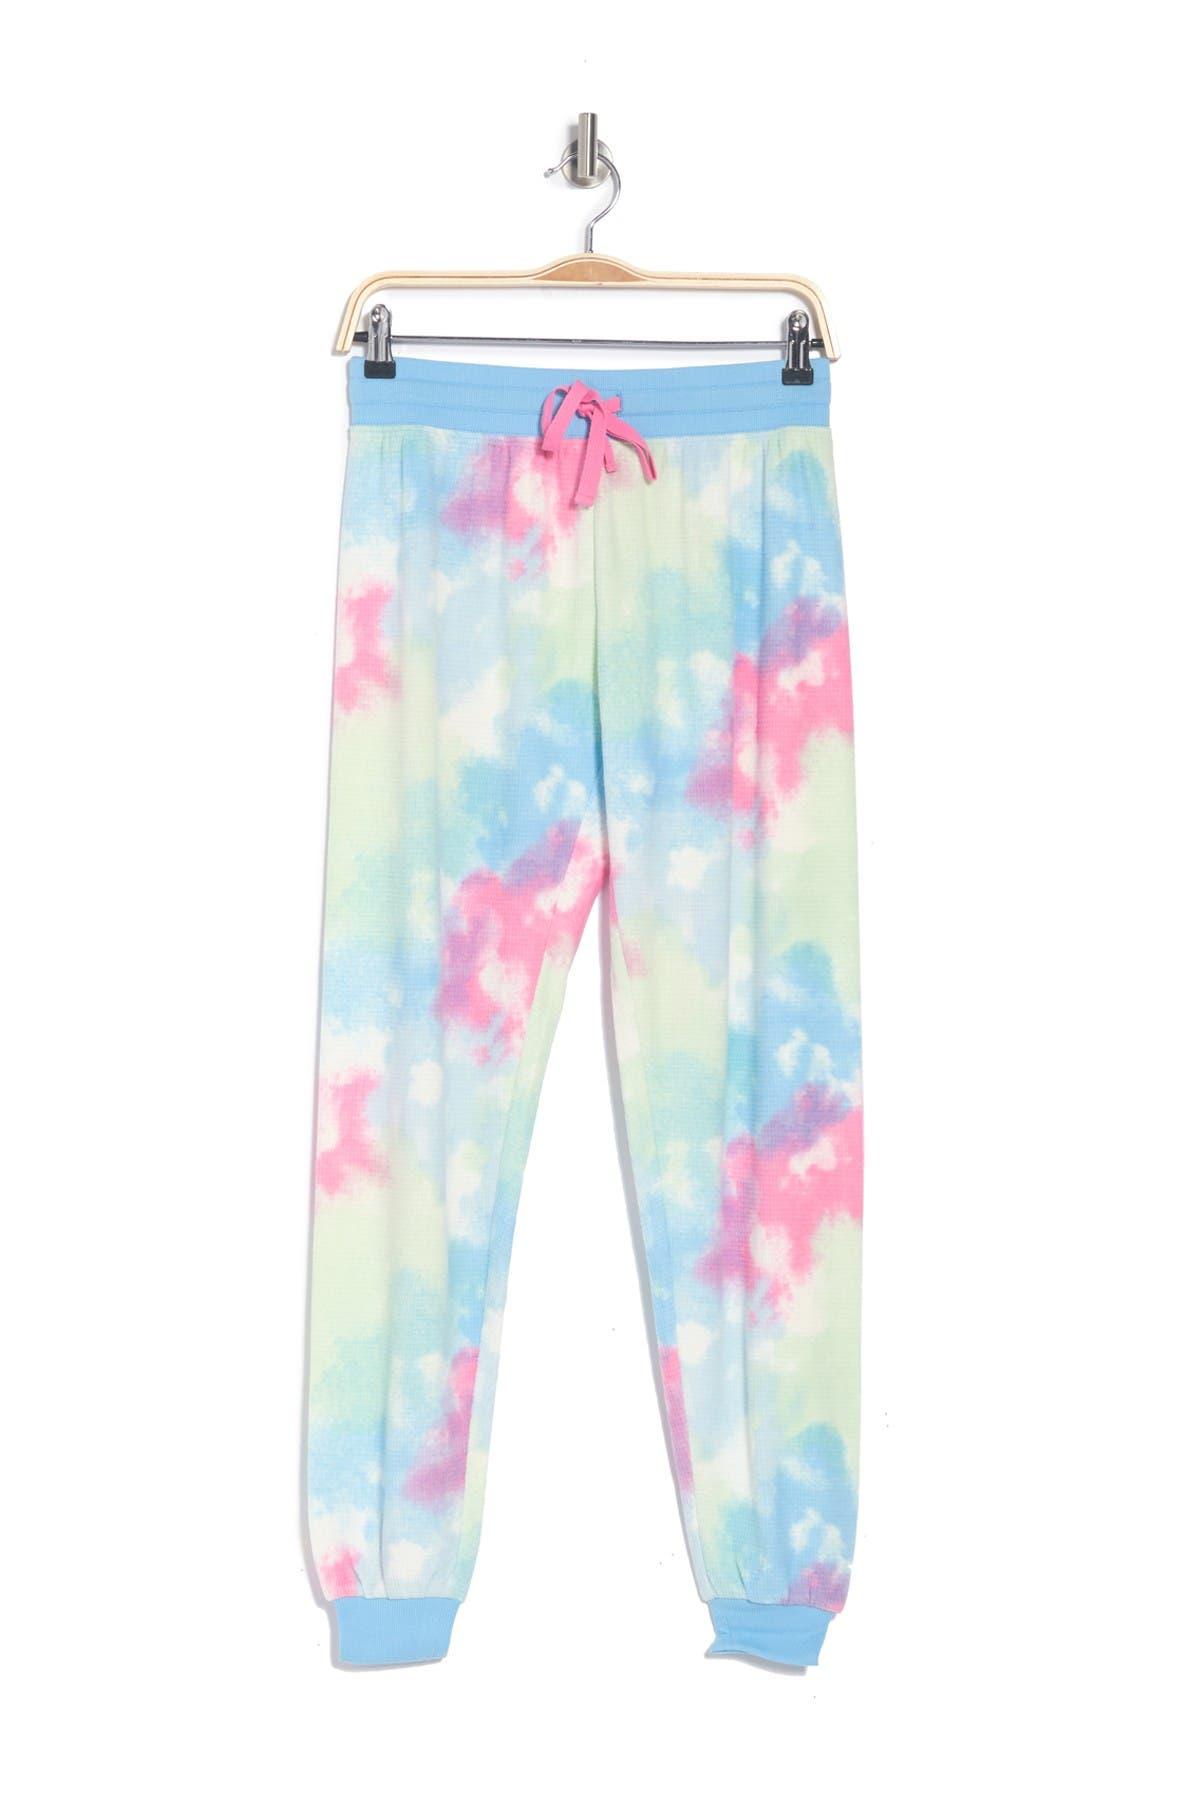 Free Press Waffle Microfleece Patterned Pajama Jogger Pants